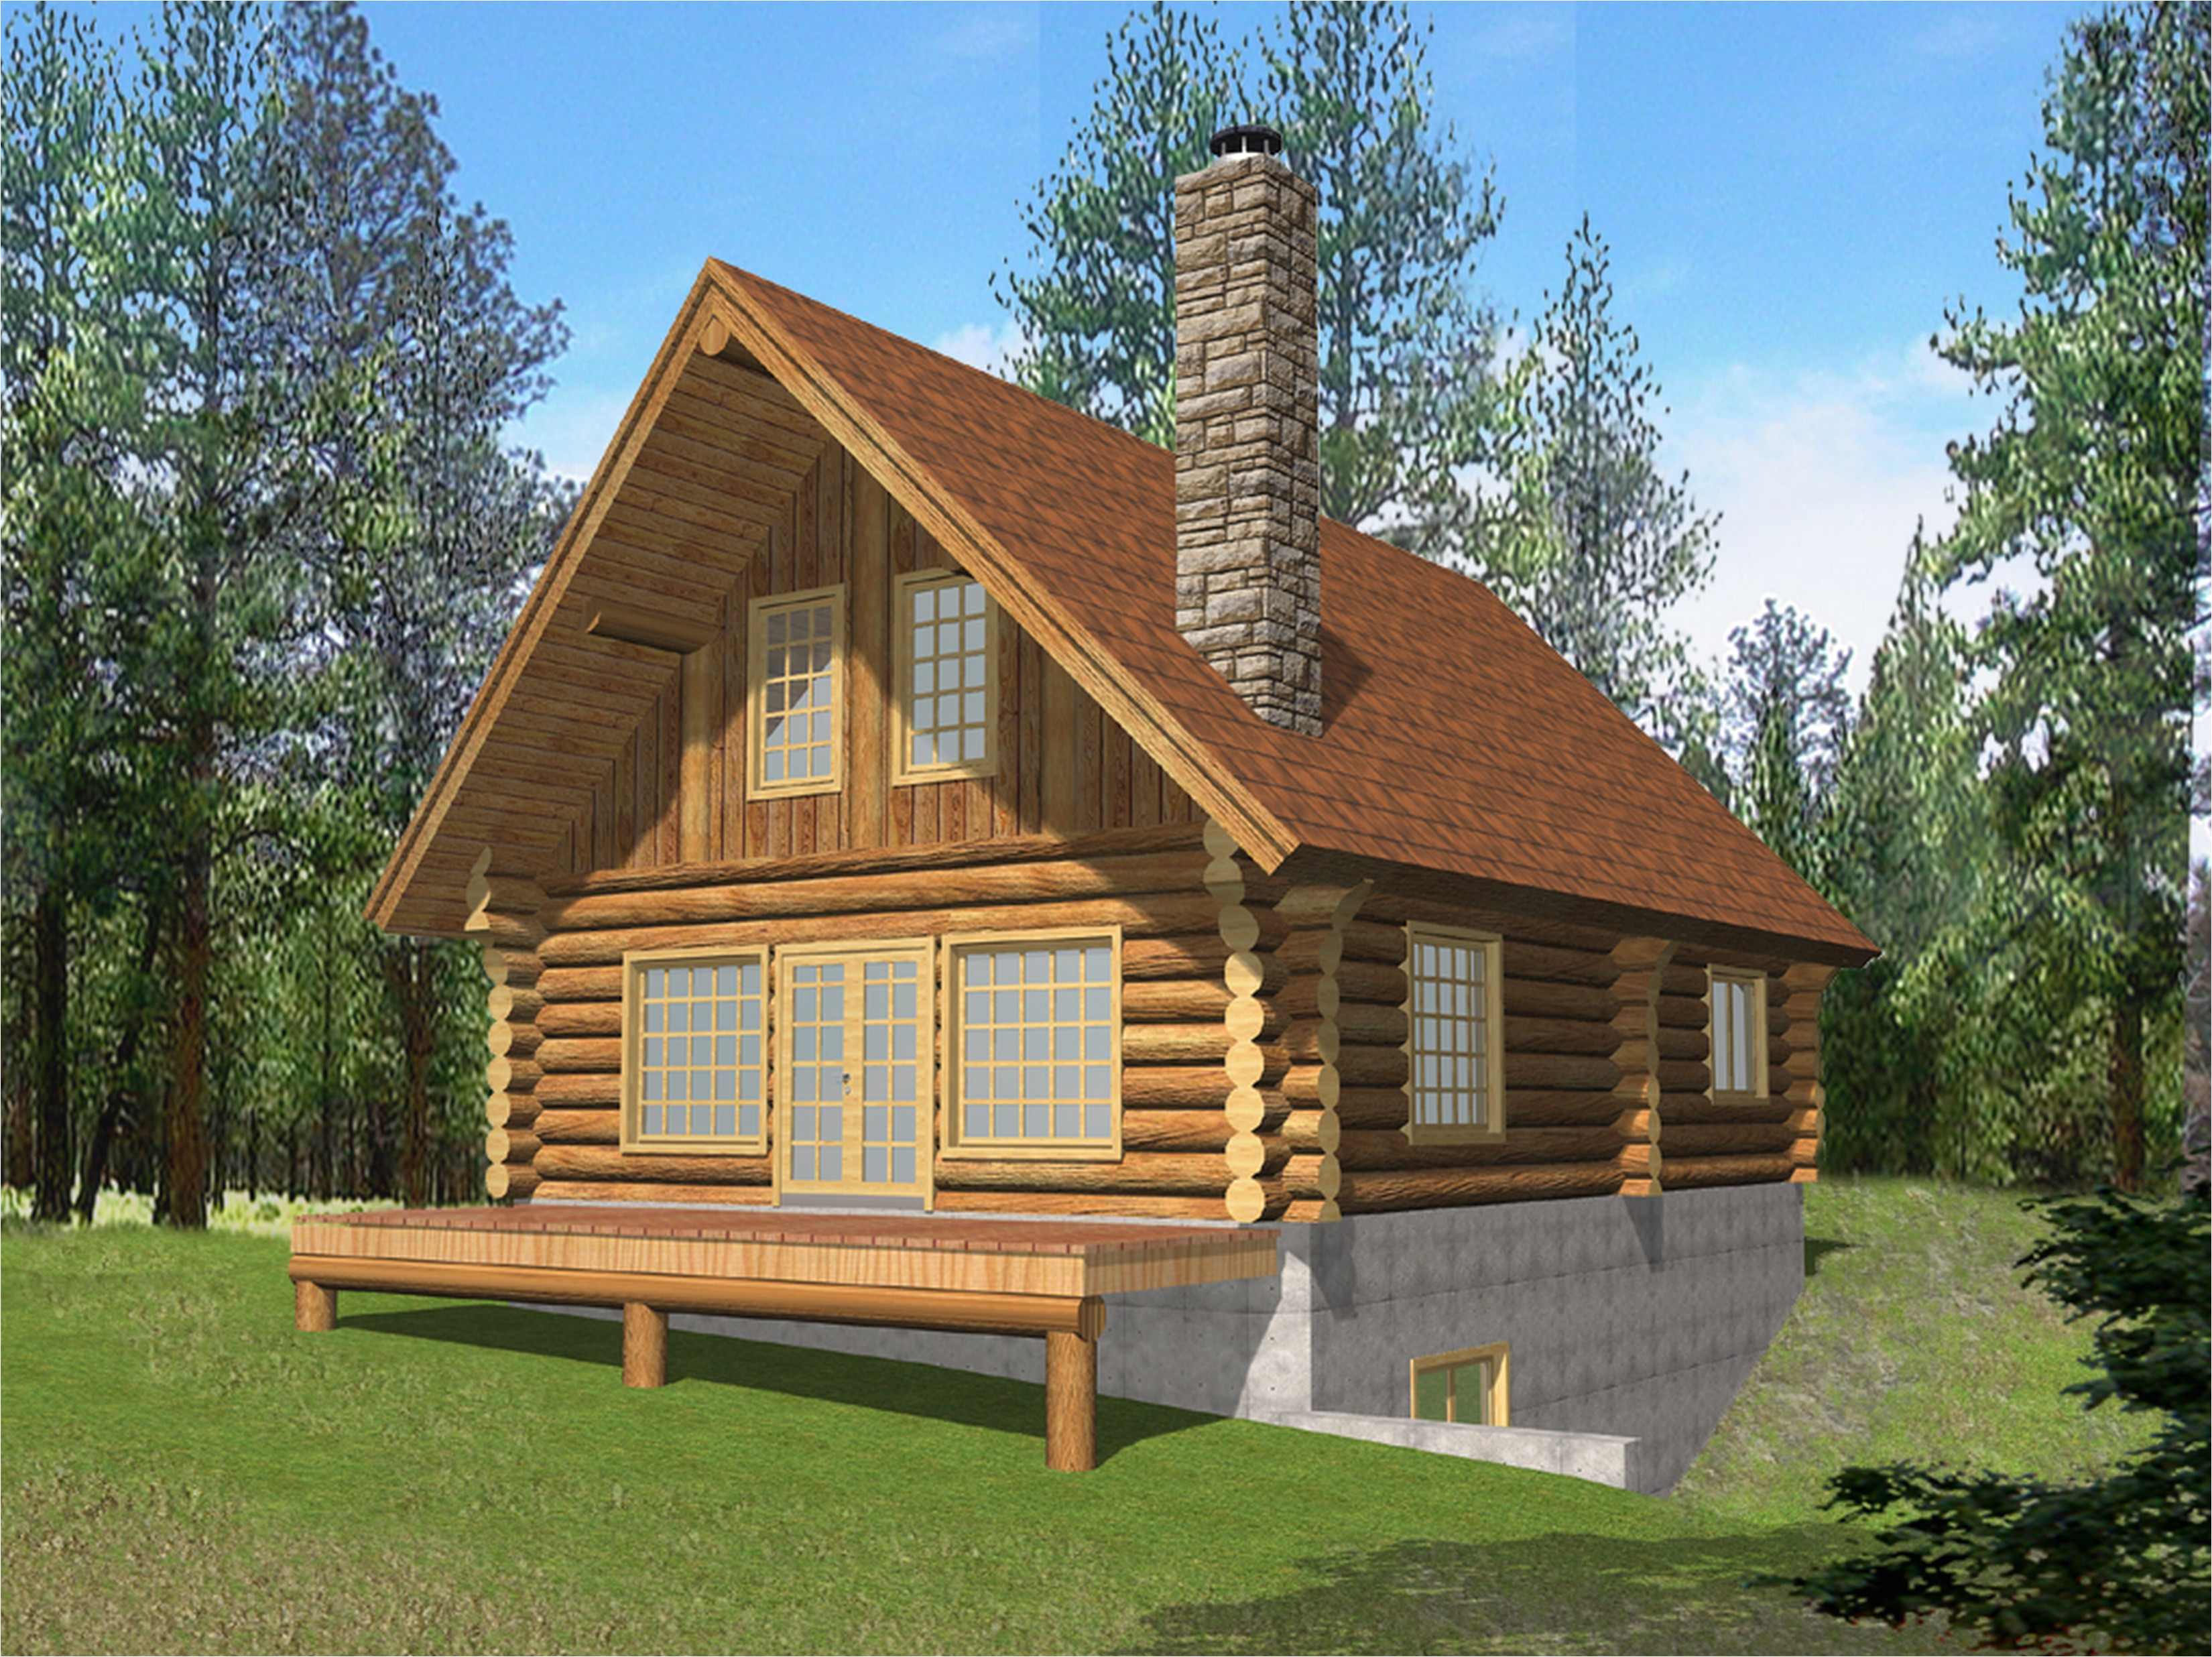 House Plans Log Homes Log Home Plans with Loft Smalltowndjs Com